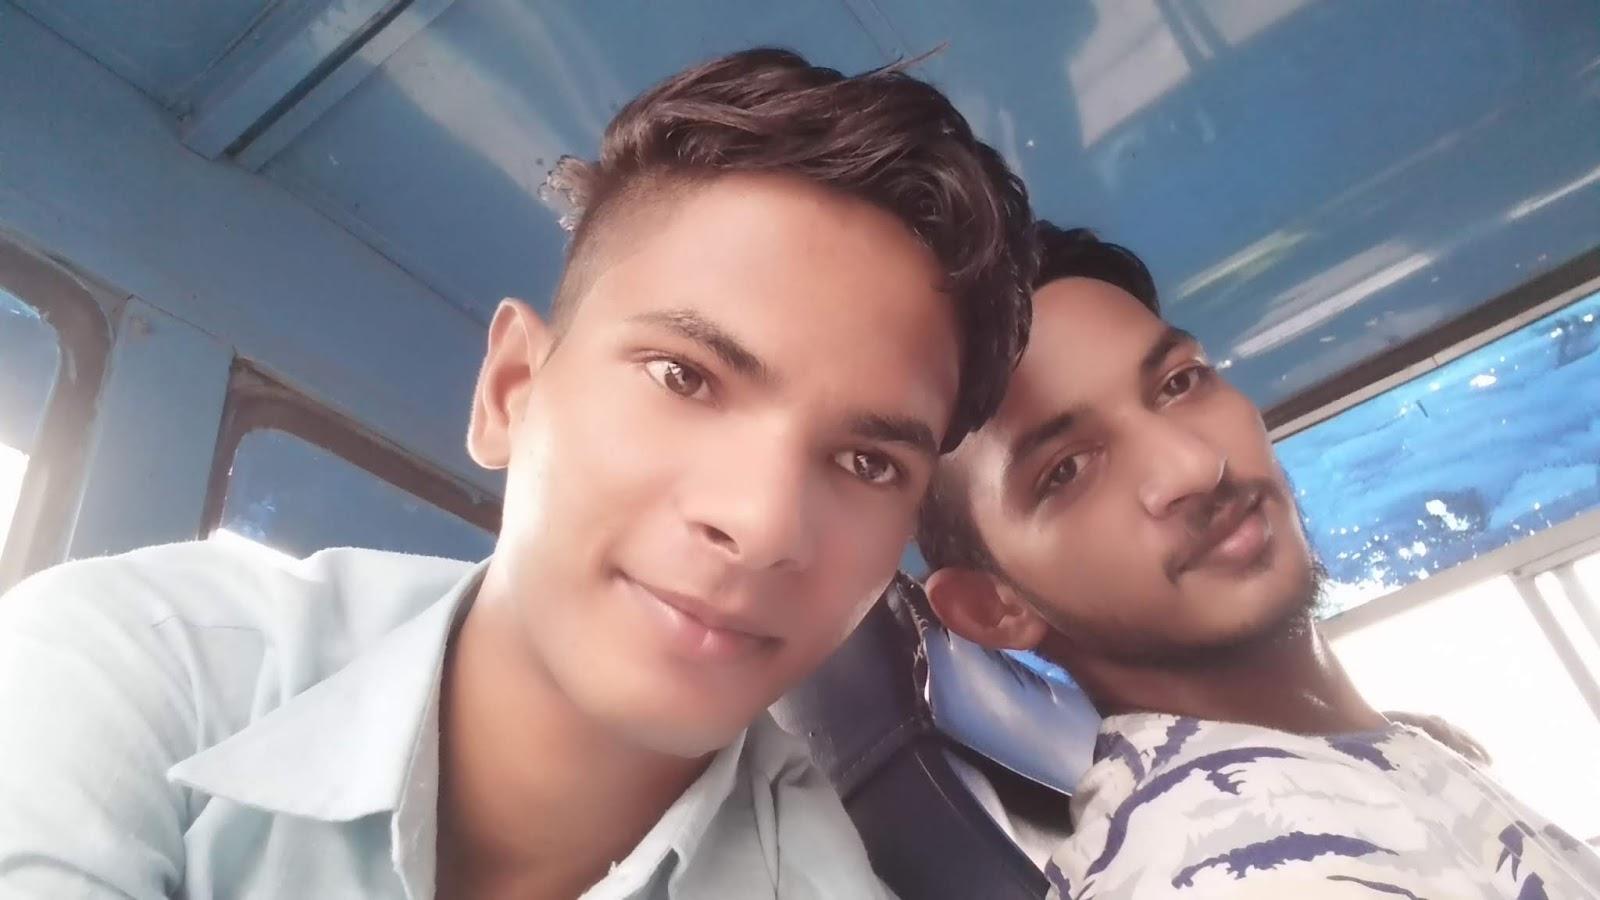 Pardeep Lalton || Pardeep Ghavri || Pardeep Kumar